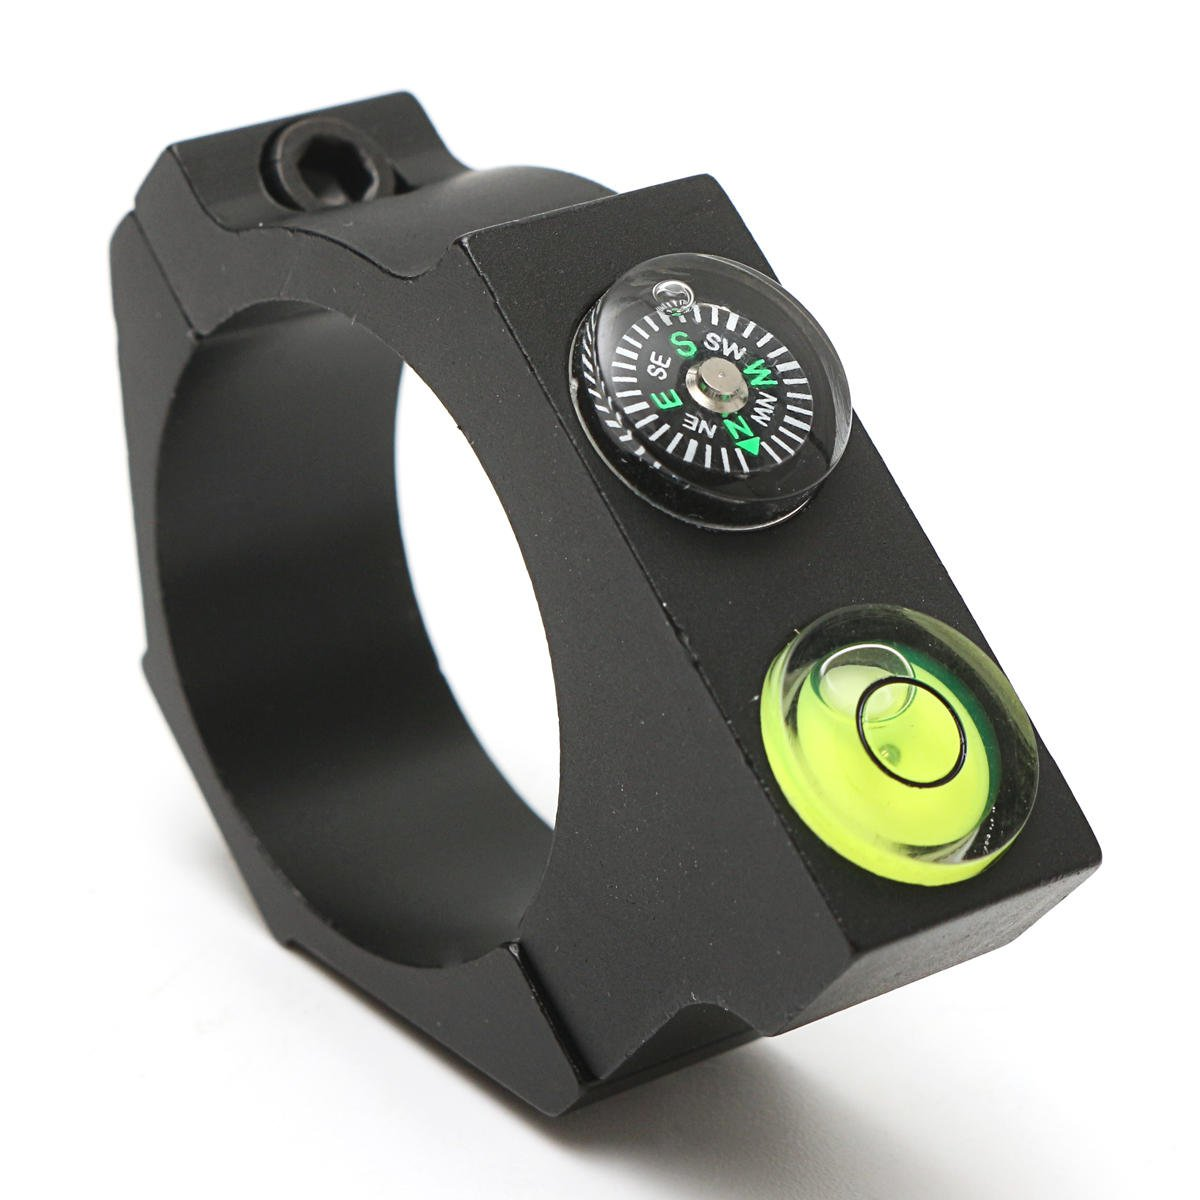 Outdoors Optical Rifle Compass Horizontal Circle Aim Bracket Riflescope Anti-cant, Hunting